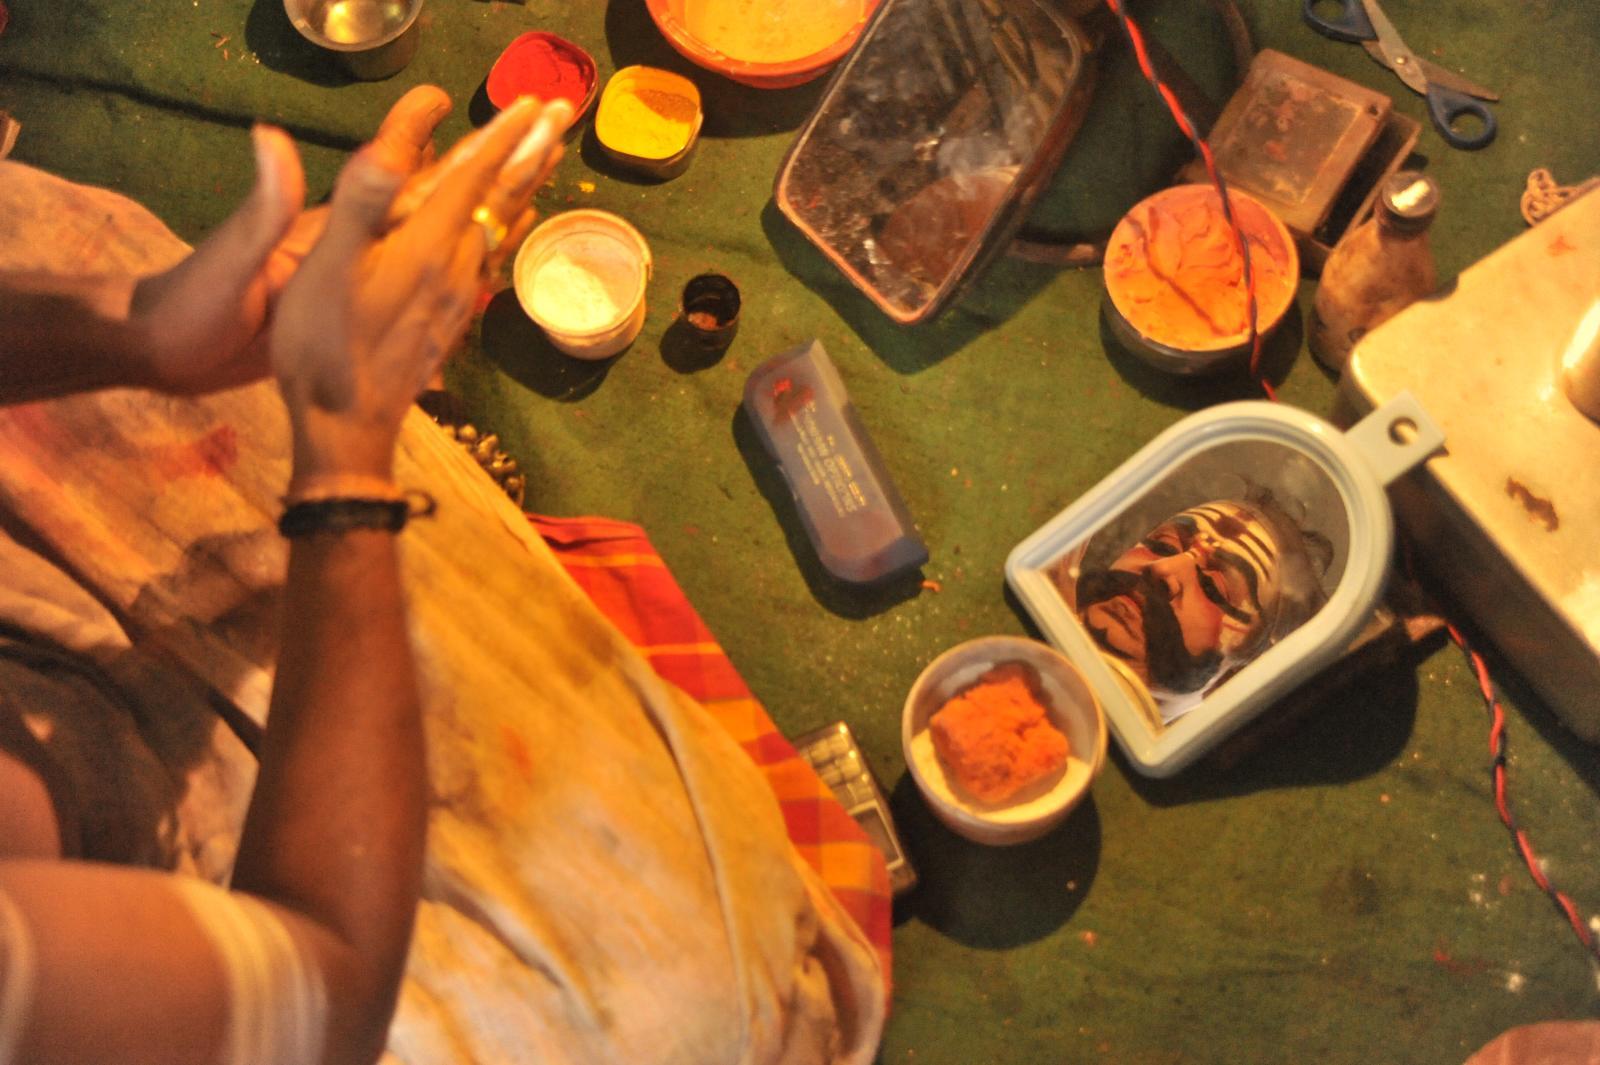 Getting ready for the inaugurals - Bhima, Yakshagana Kichaka Vadha